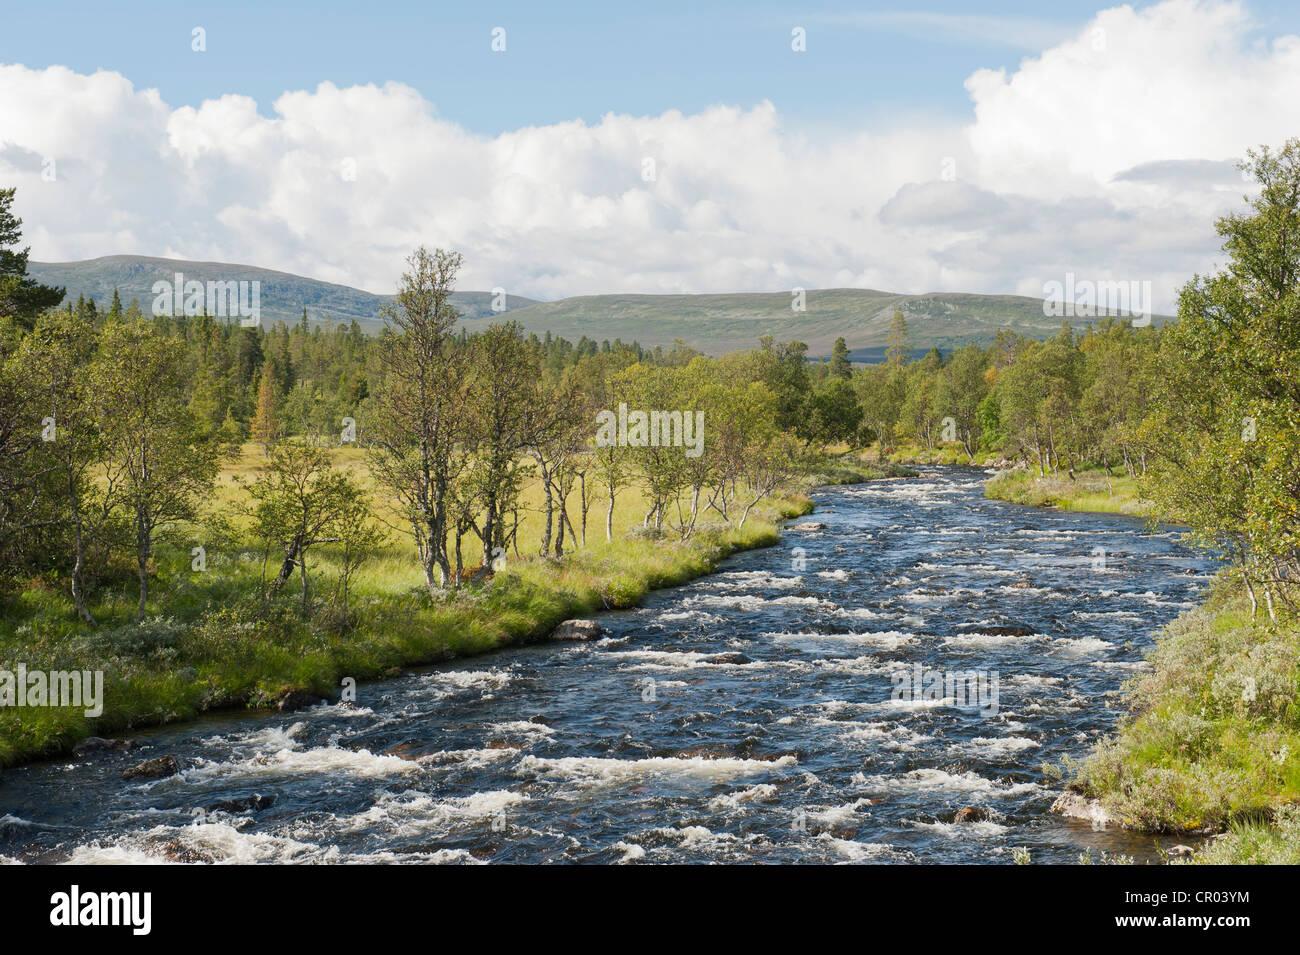 Desierto, con rápidos, río Groevlan Langfjaellet Reserva Natural cerca Groevelsjoen, provincia de Dalarna, Imagen De Stock